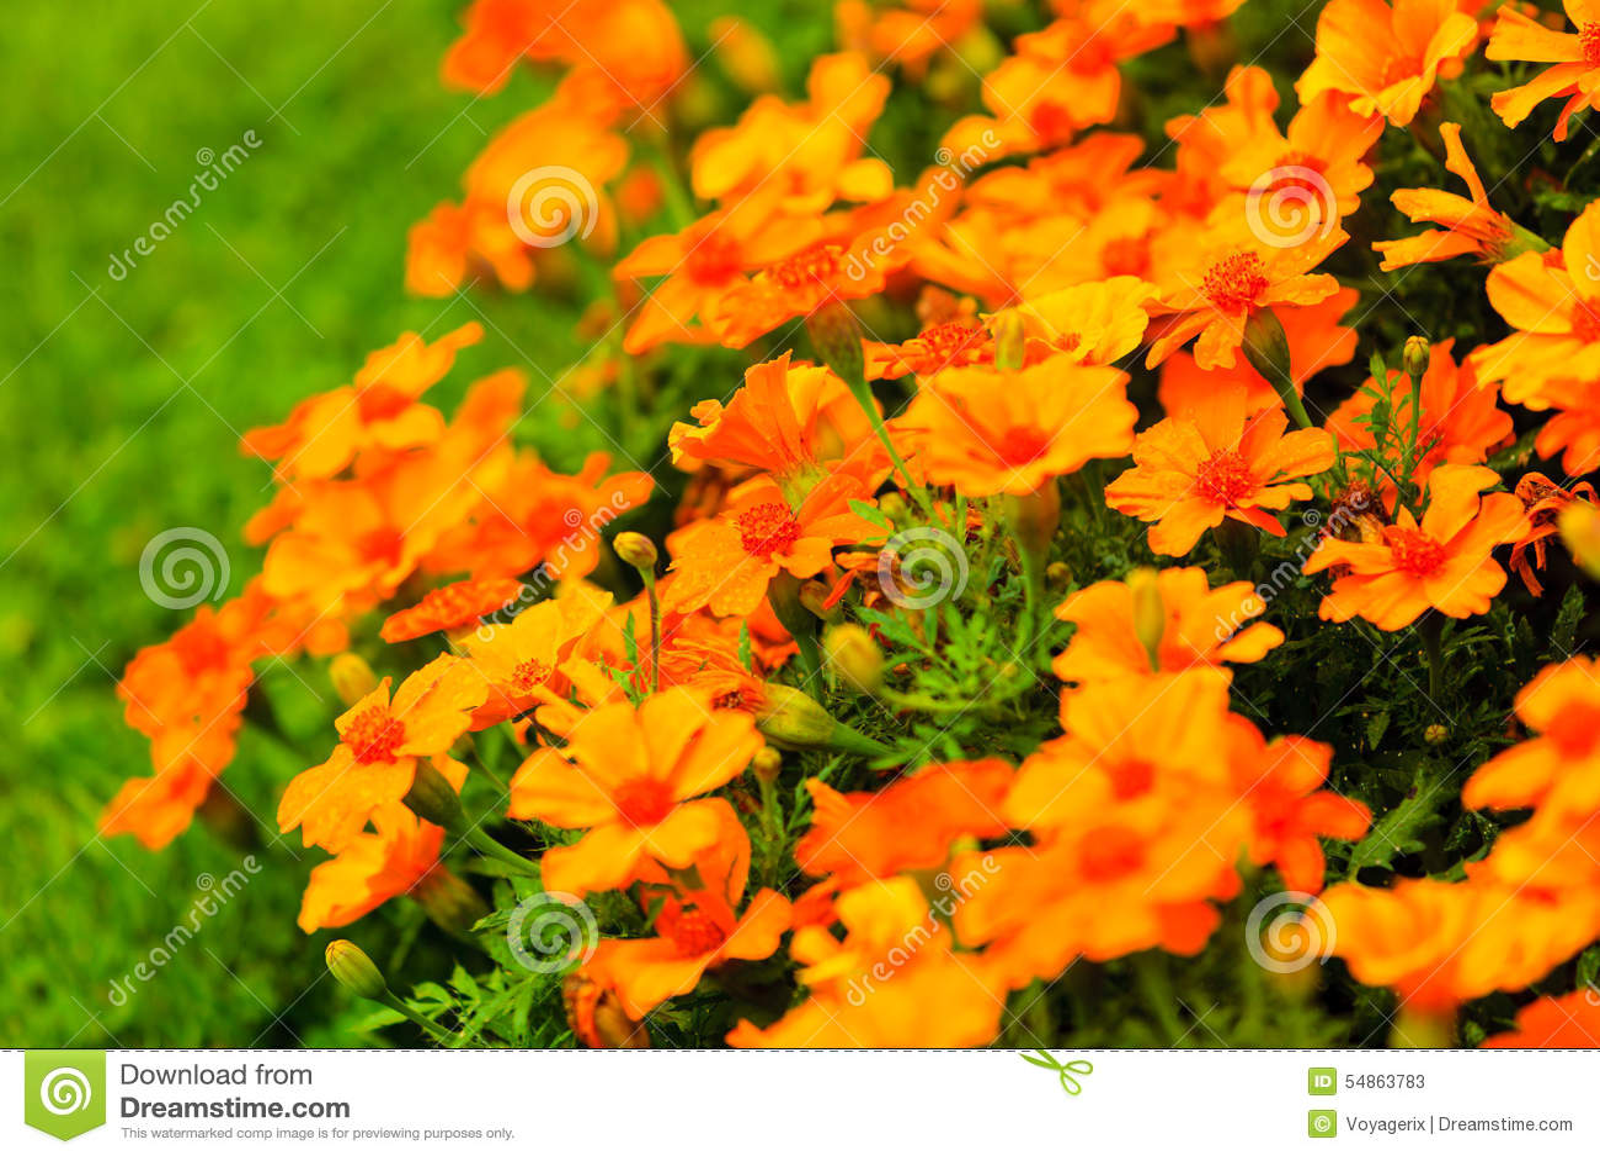 Orange Flowers In The Garden Spring Or Summer Background Stock